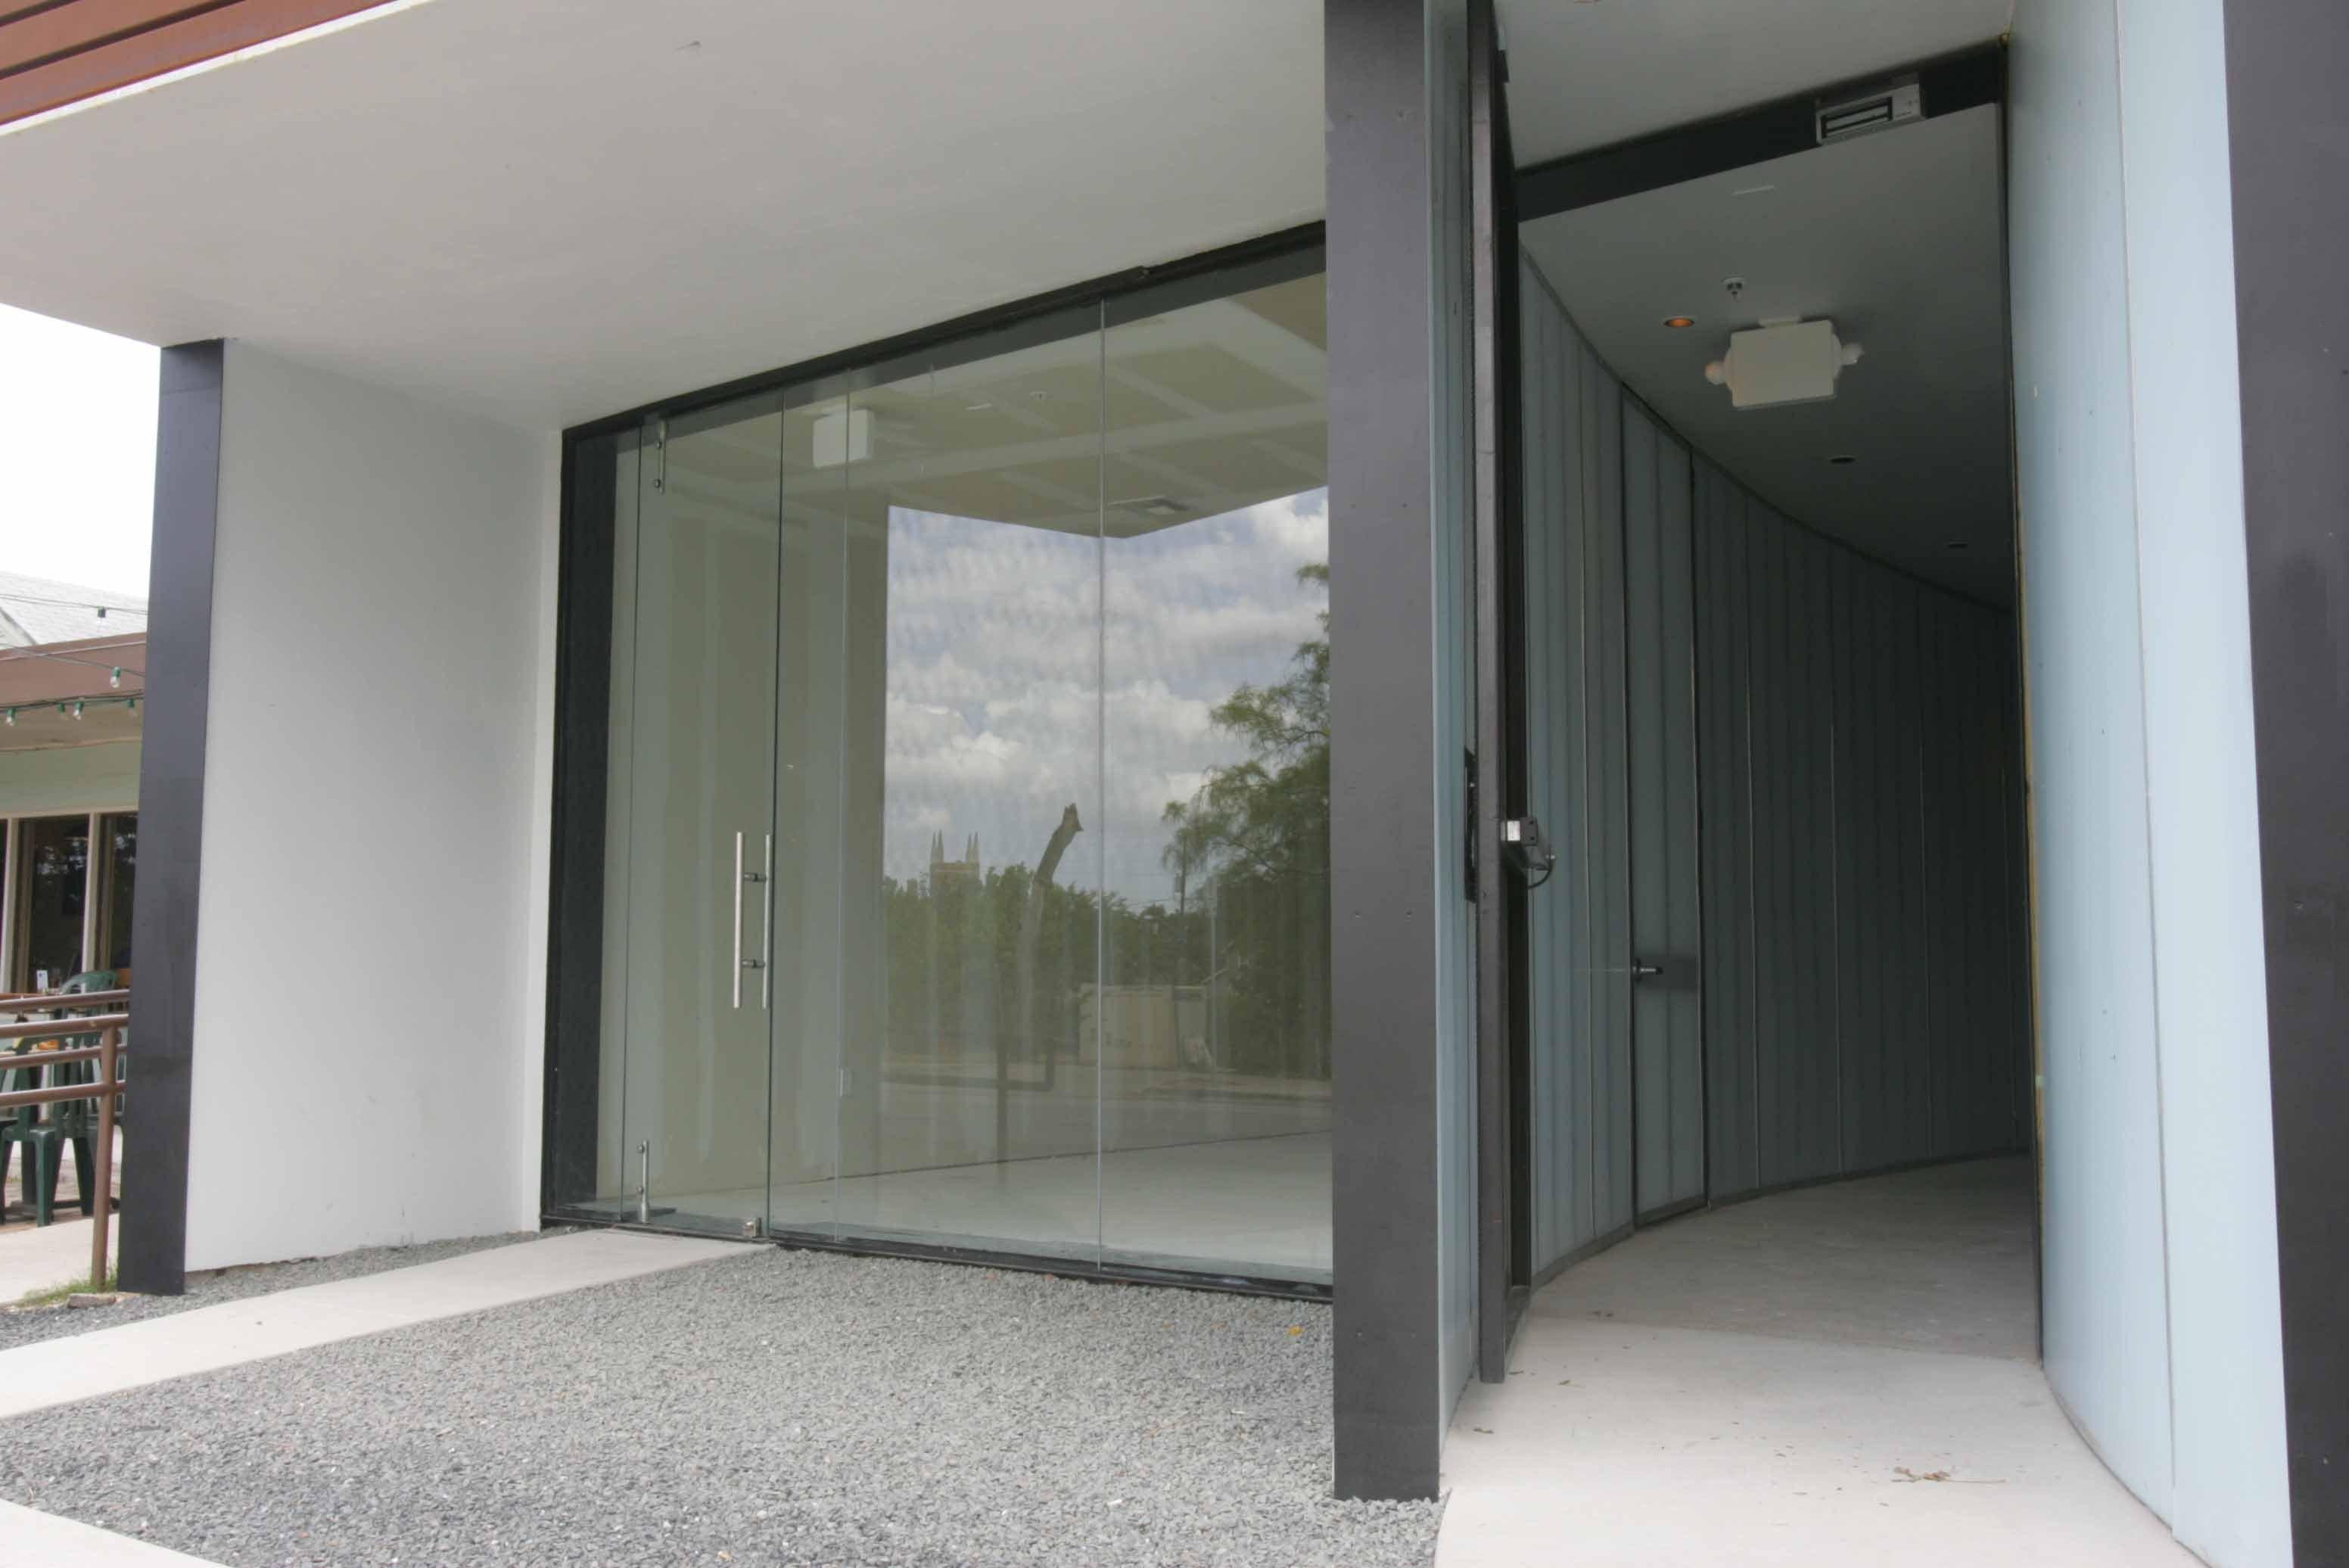 Exceptional Status: Built Location: Austin, TX, US My Role: Designer U0026 Builder  Additional Credits: Bercy Chen Studio, Thomas Bercy, Ryan Michael